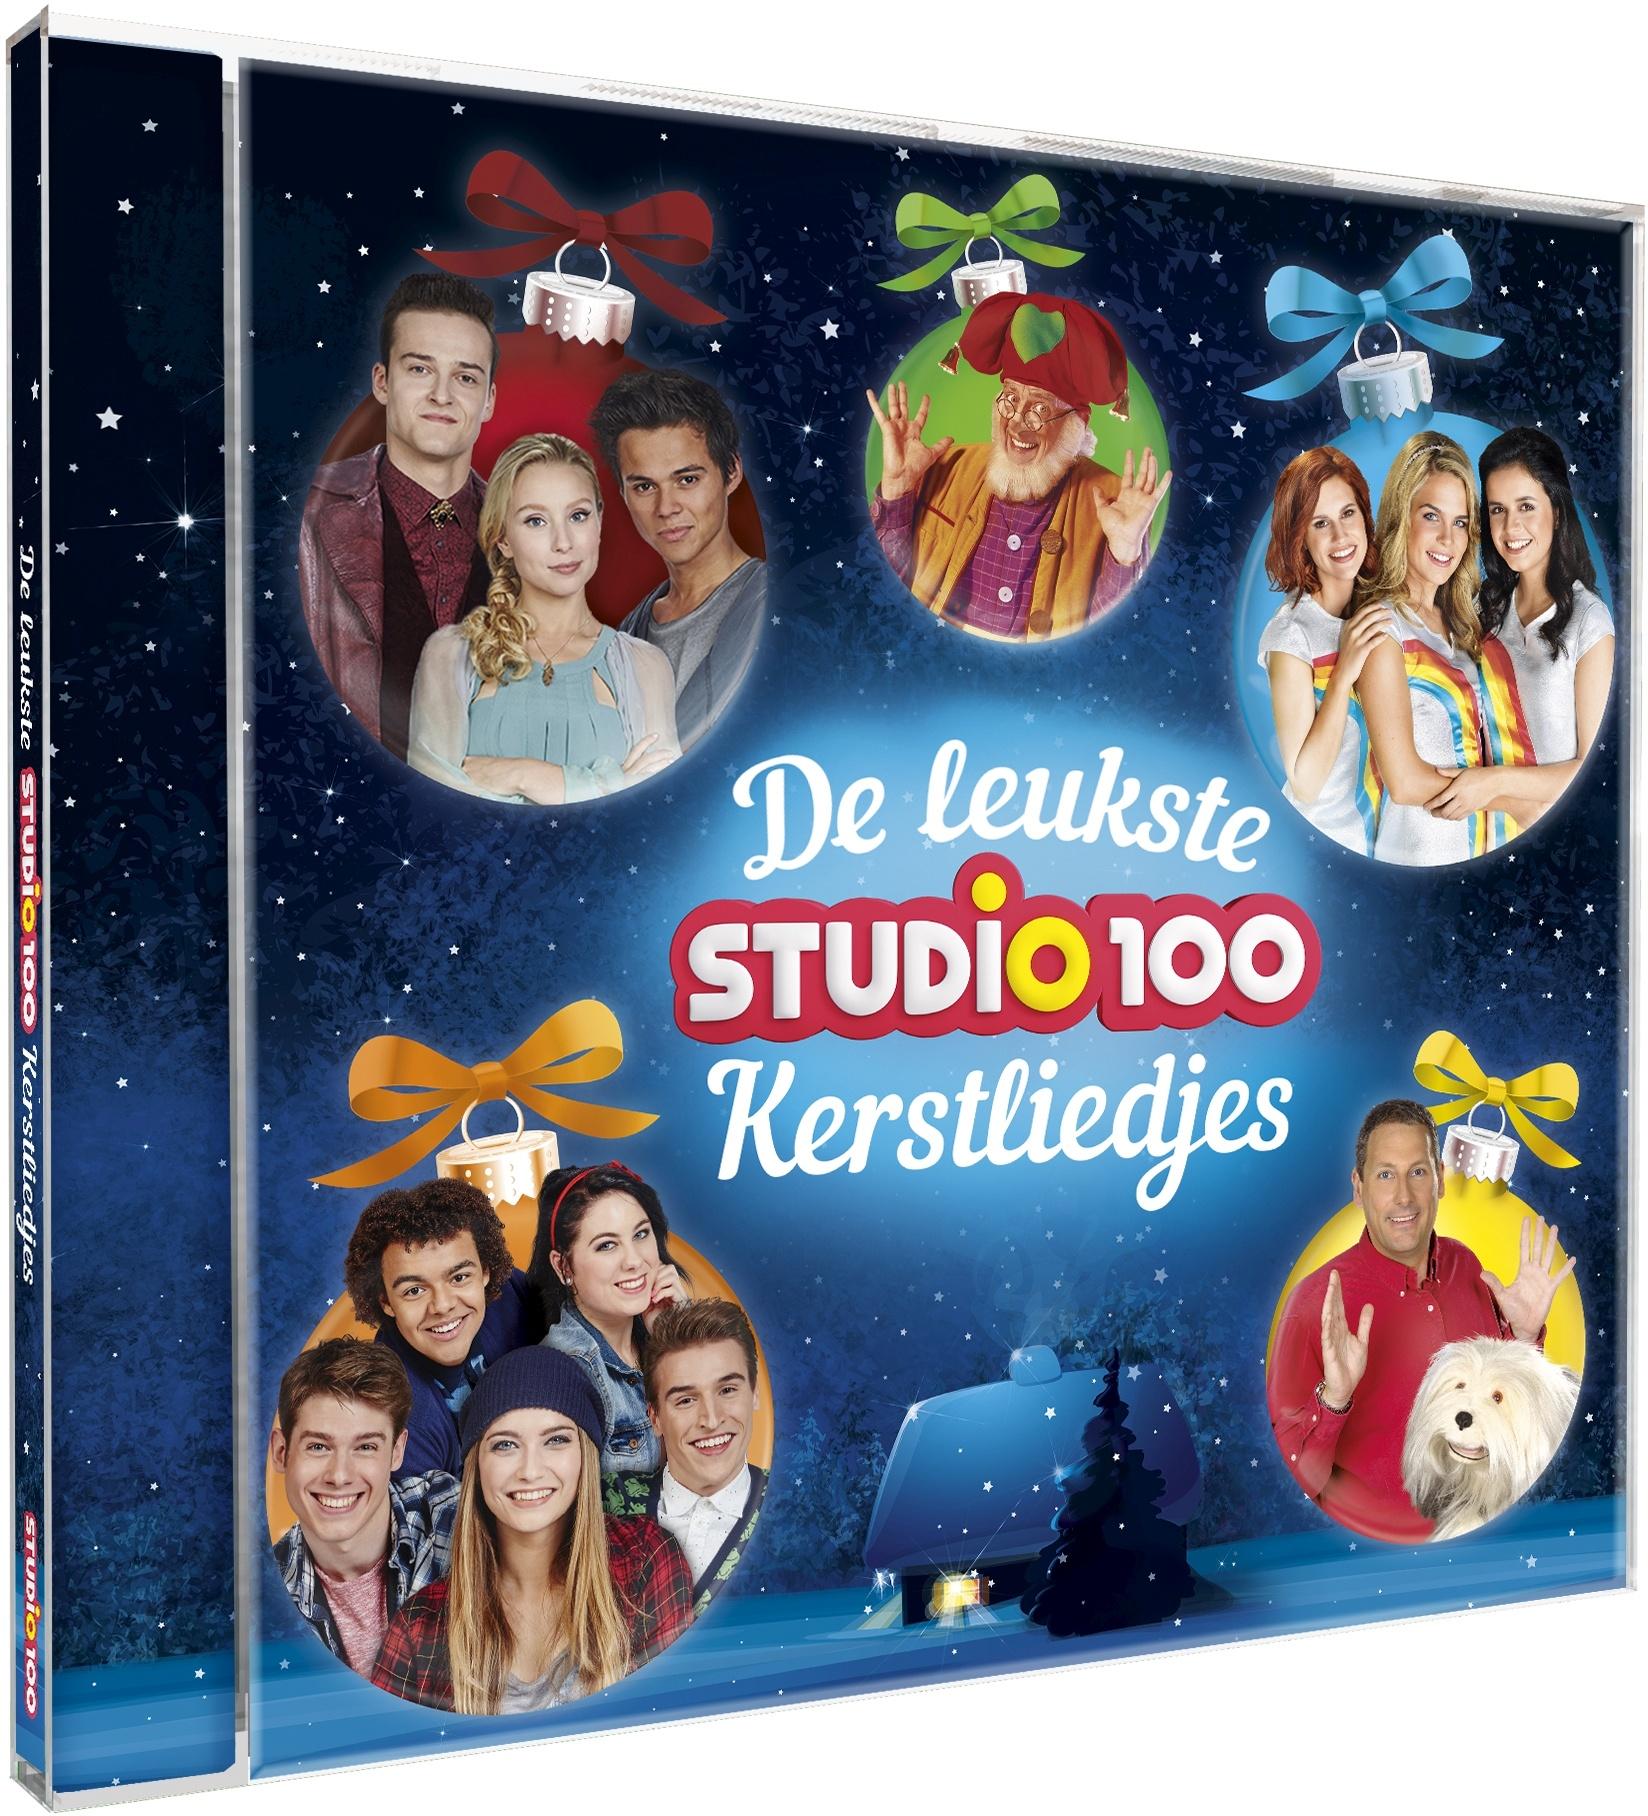 Studio 100 CD: De leukste Kerstliedjes